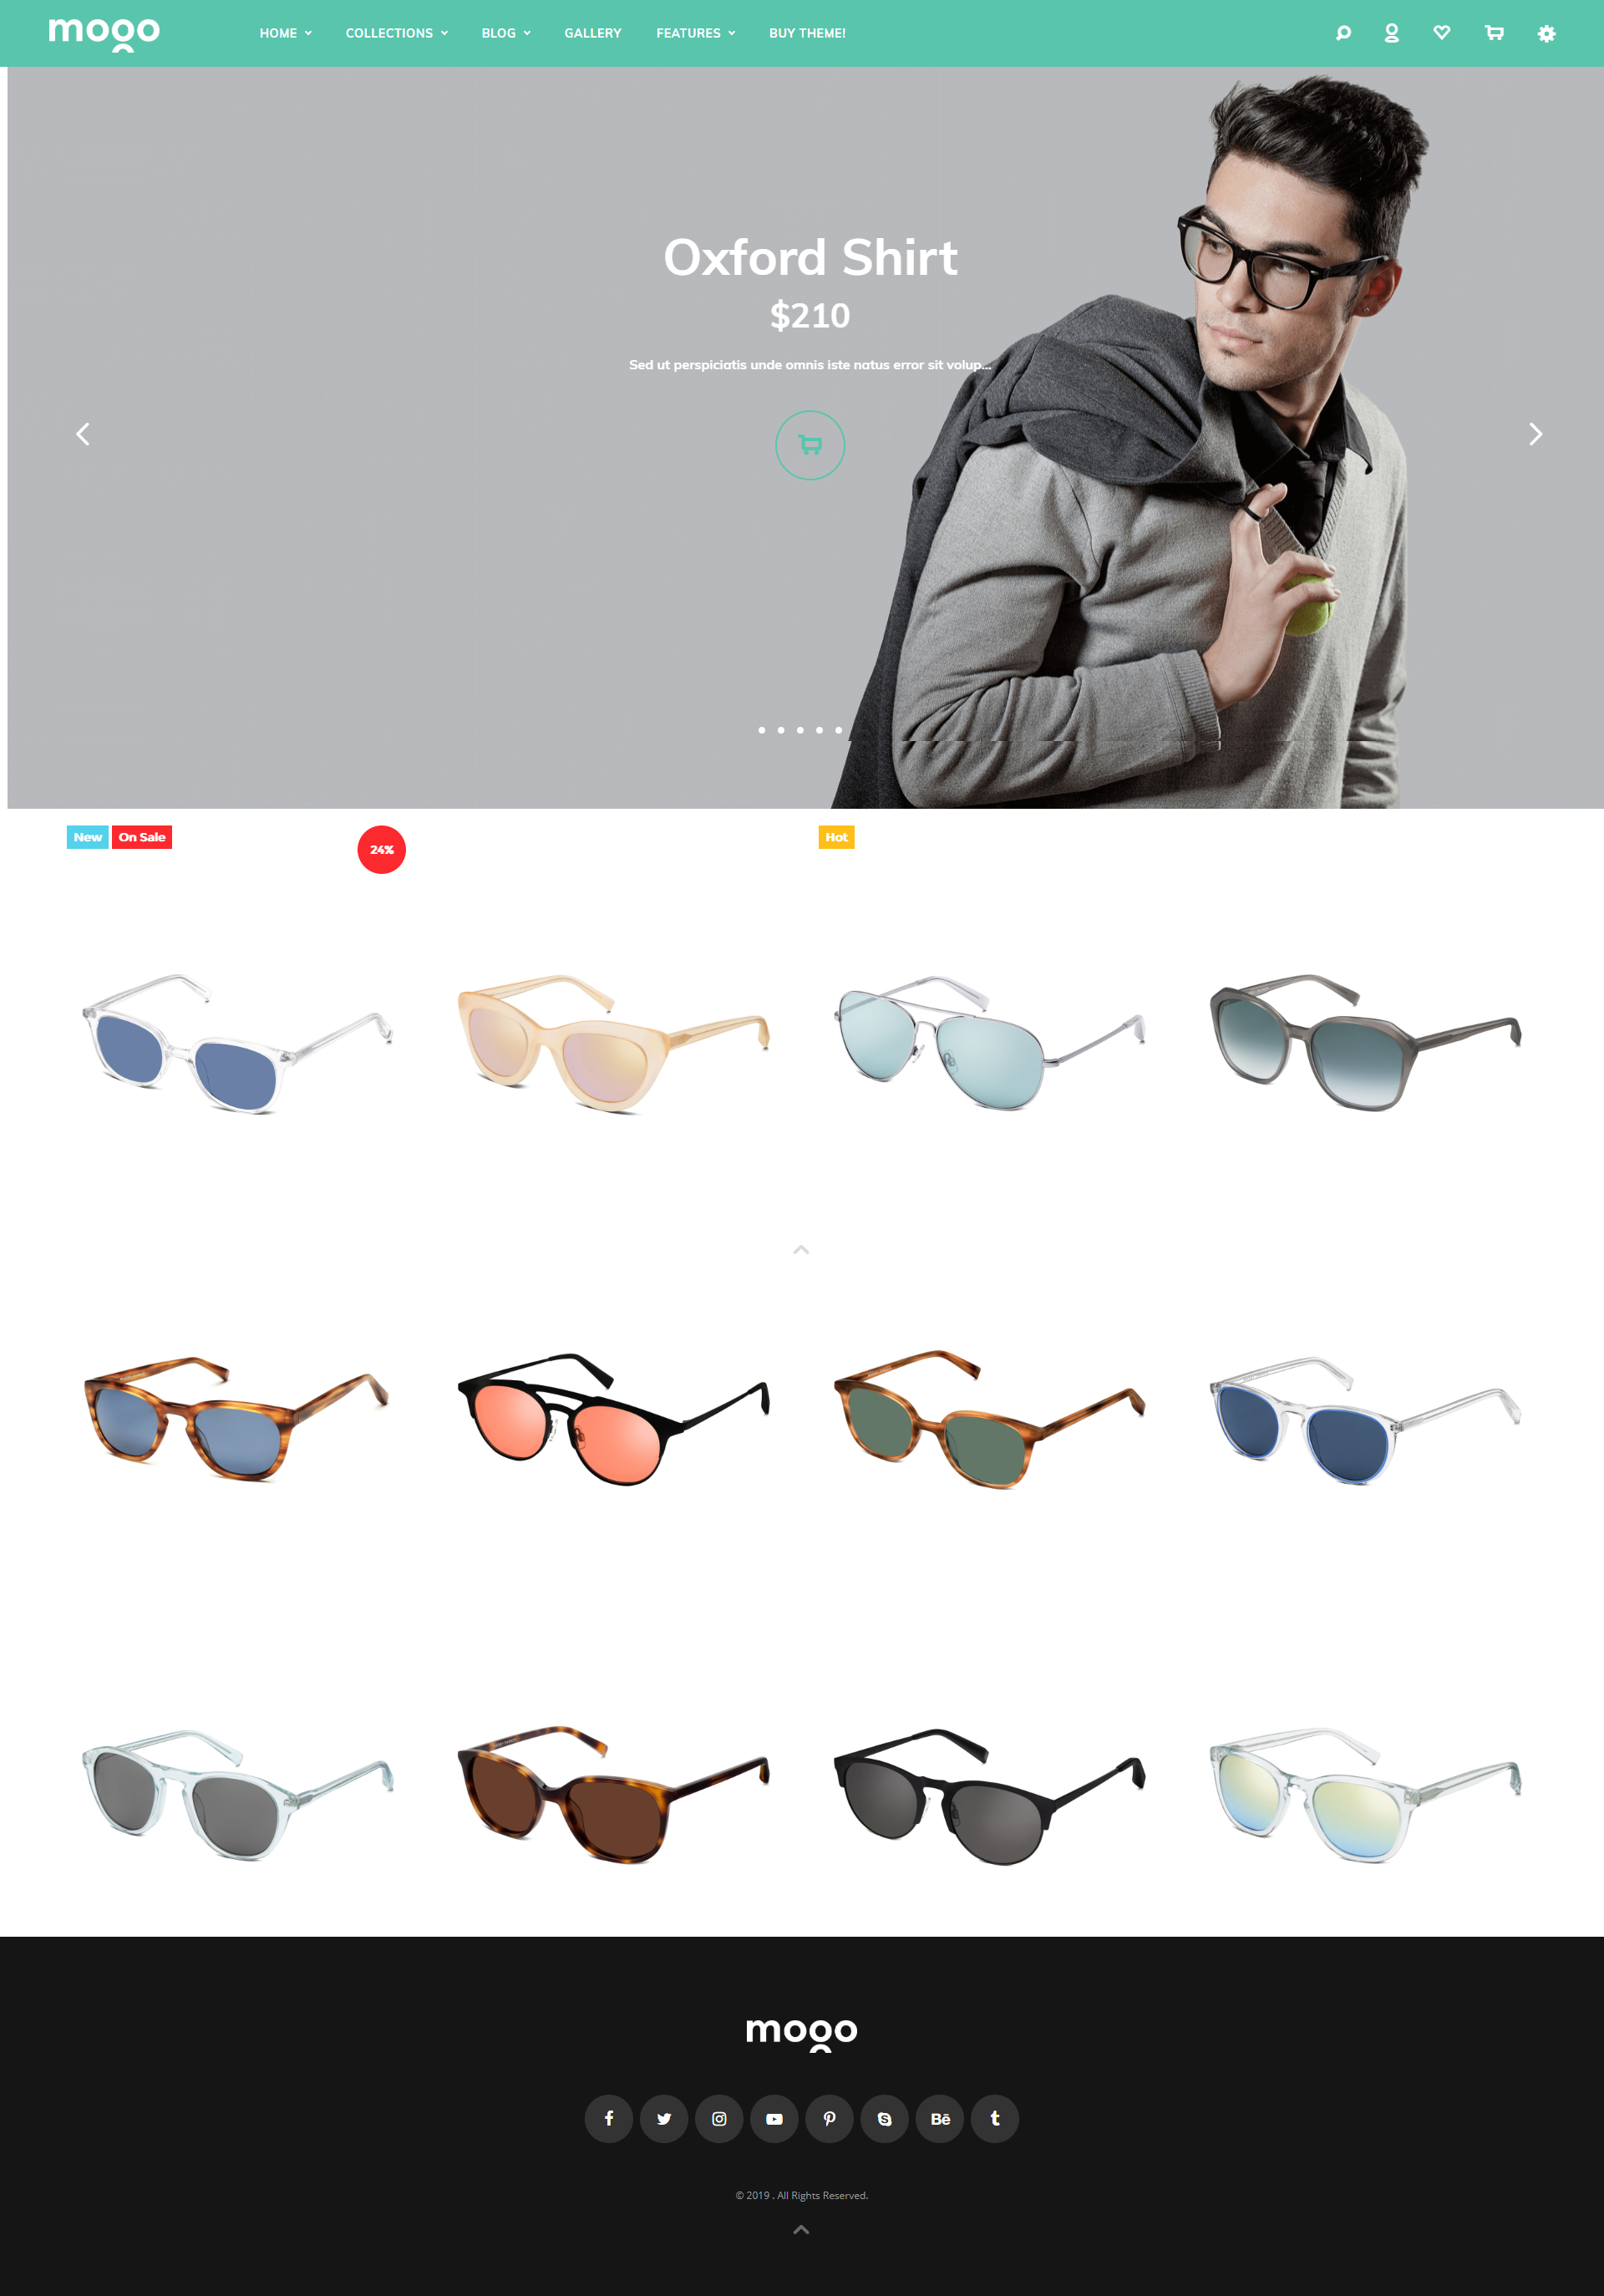 Glasses shopify theme, live demo of Mogo Shopify theme #3